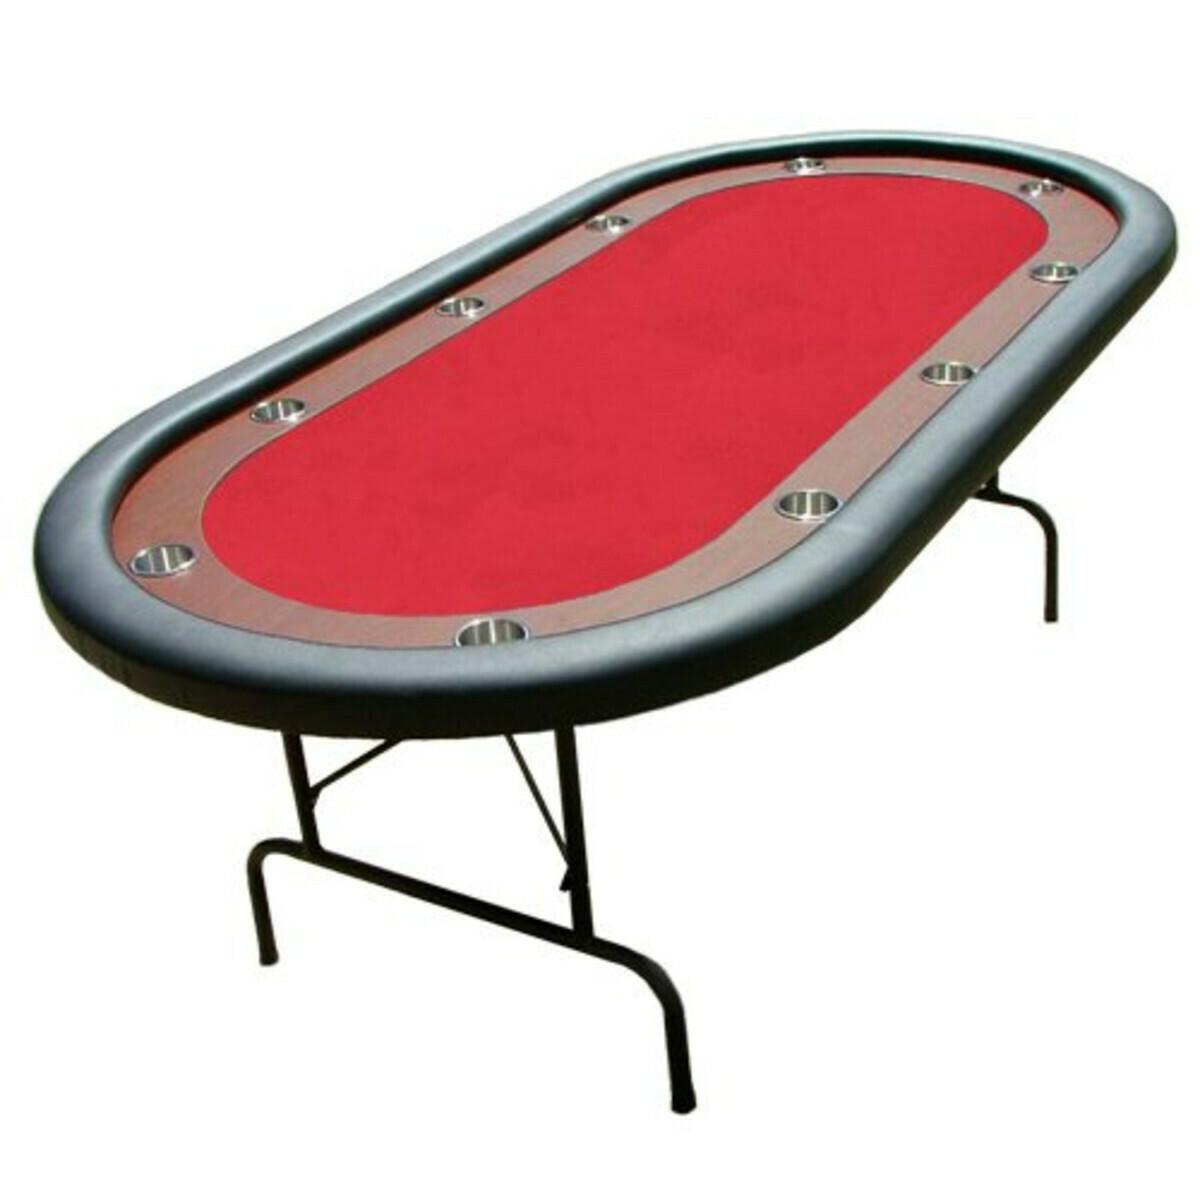 Red Felt Poker Table - Dark Wooden Veneer Race Track 84X42 SS Cup Holders